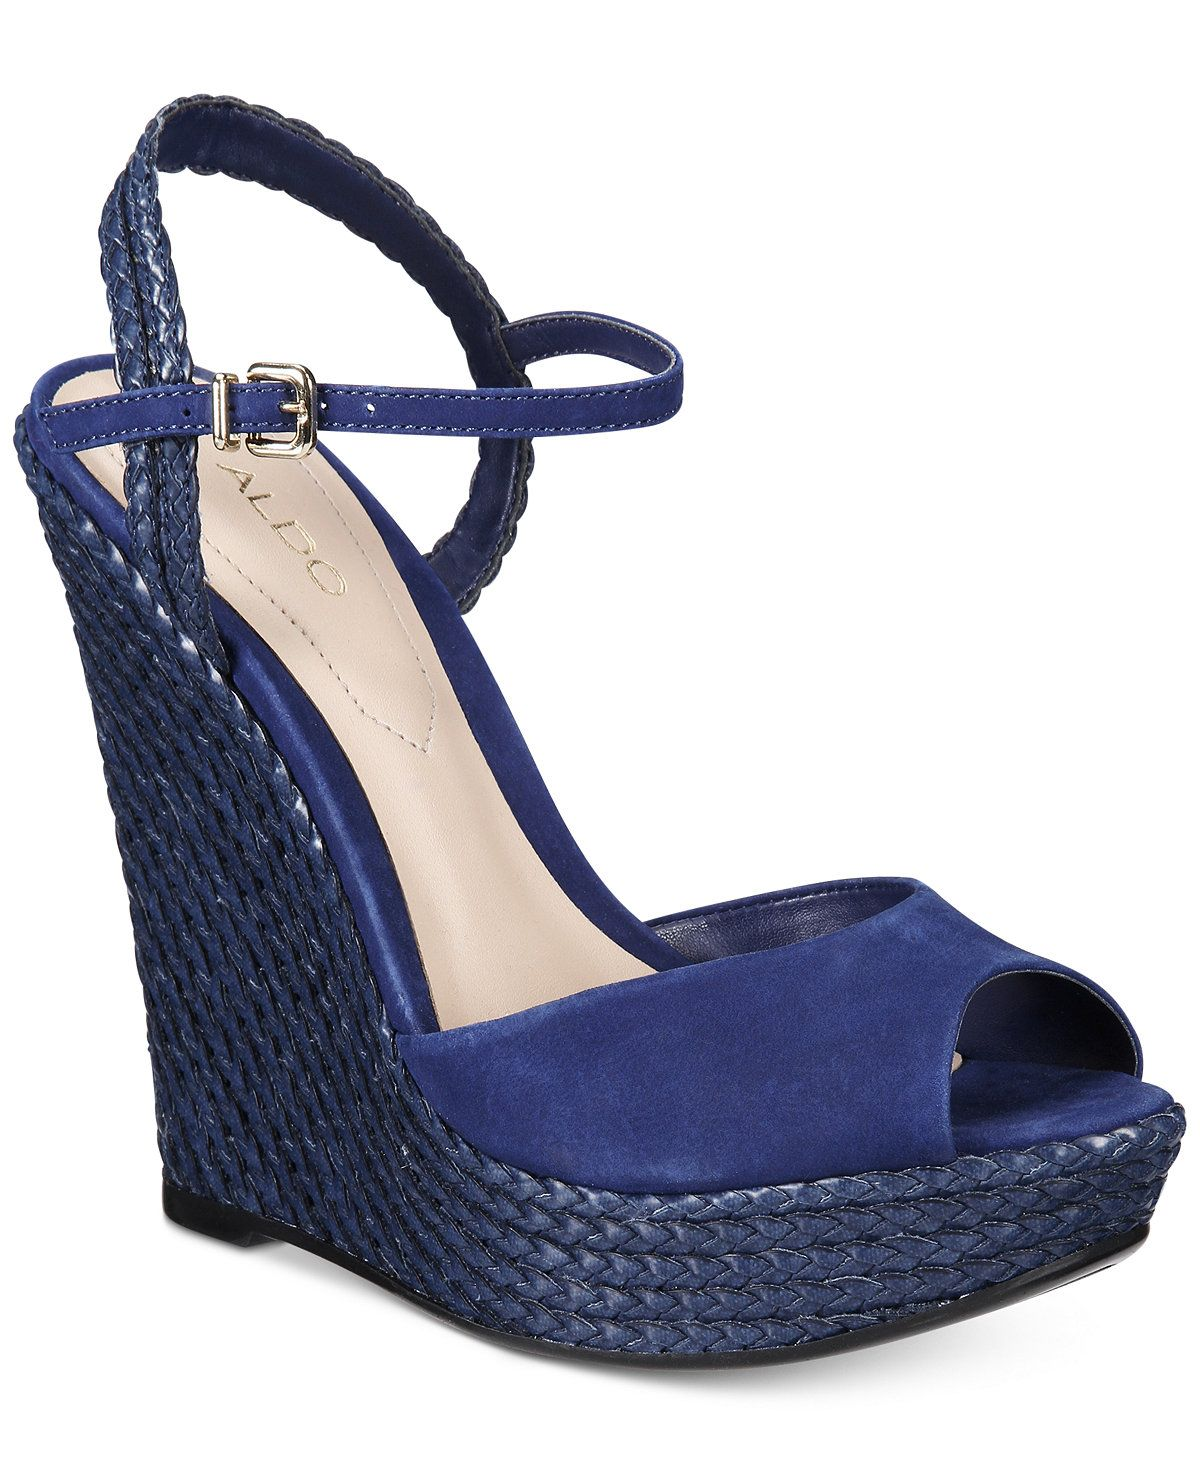 Shizuko Ankle-Strap Wedge Sandals